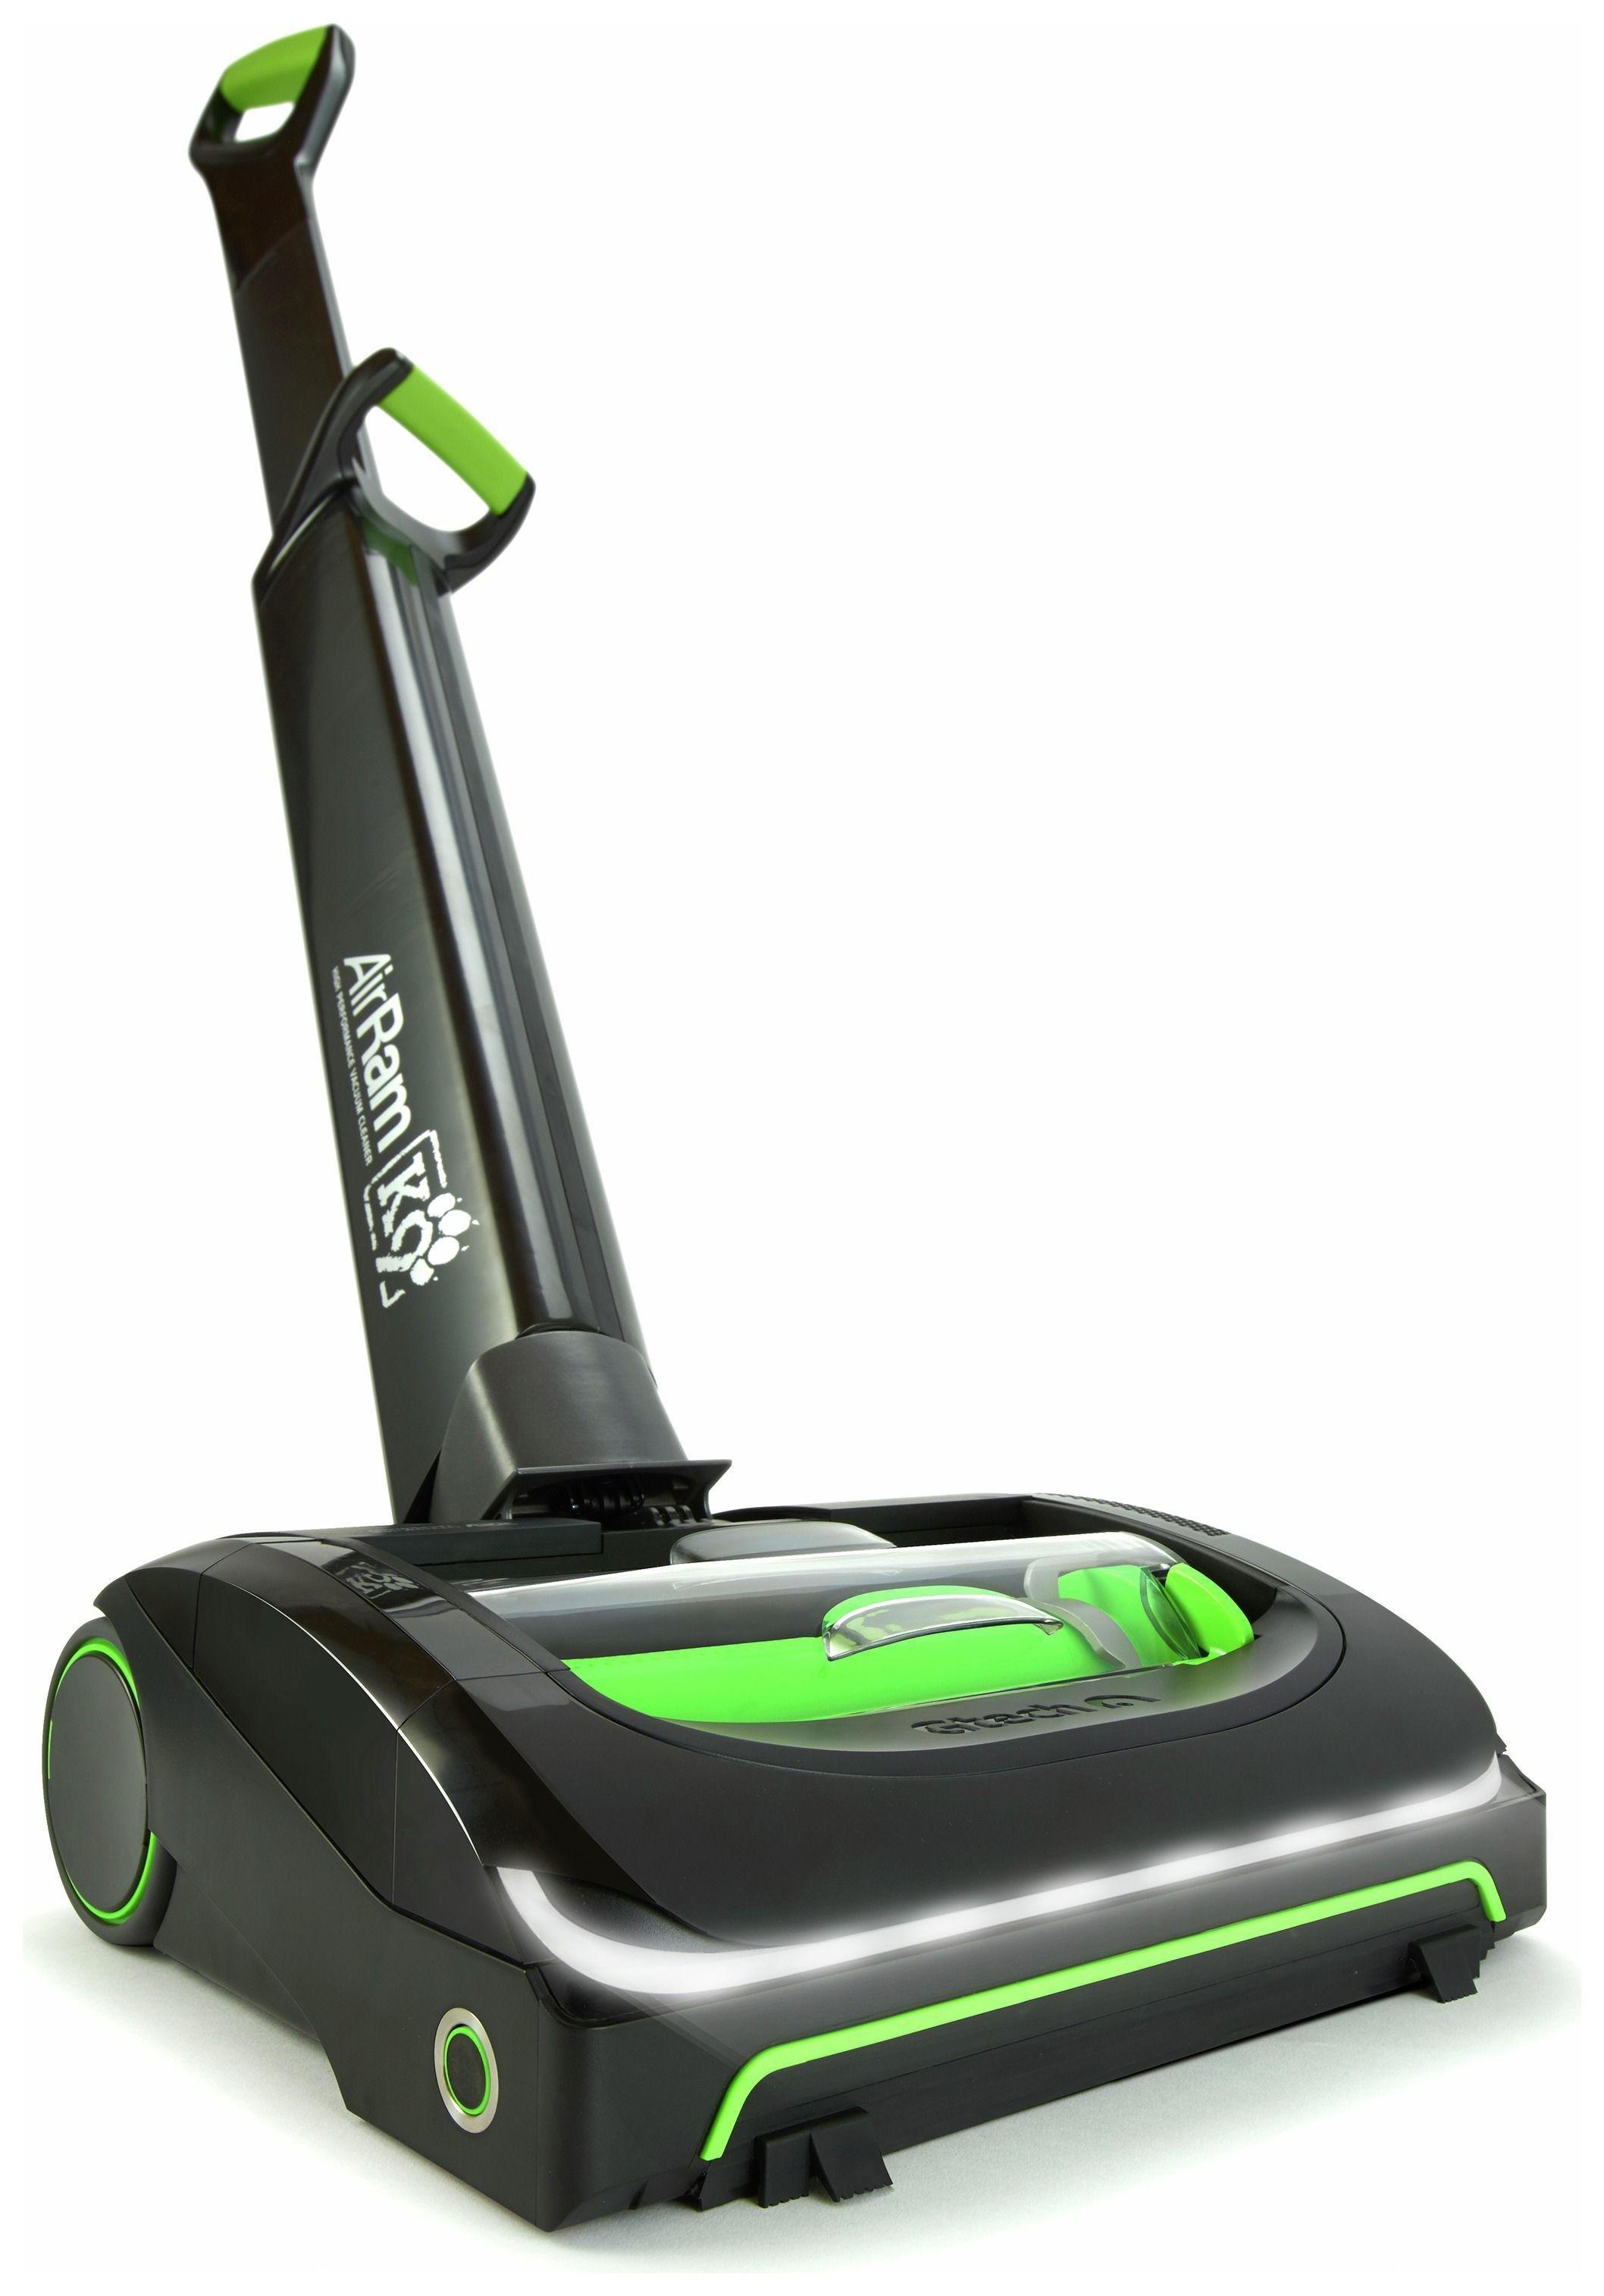 gtech air ram mk2 k9 cordless vacuum cleaner - Cordless Vacuum Cleaner